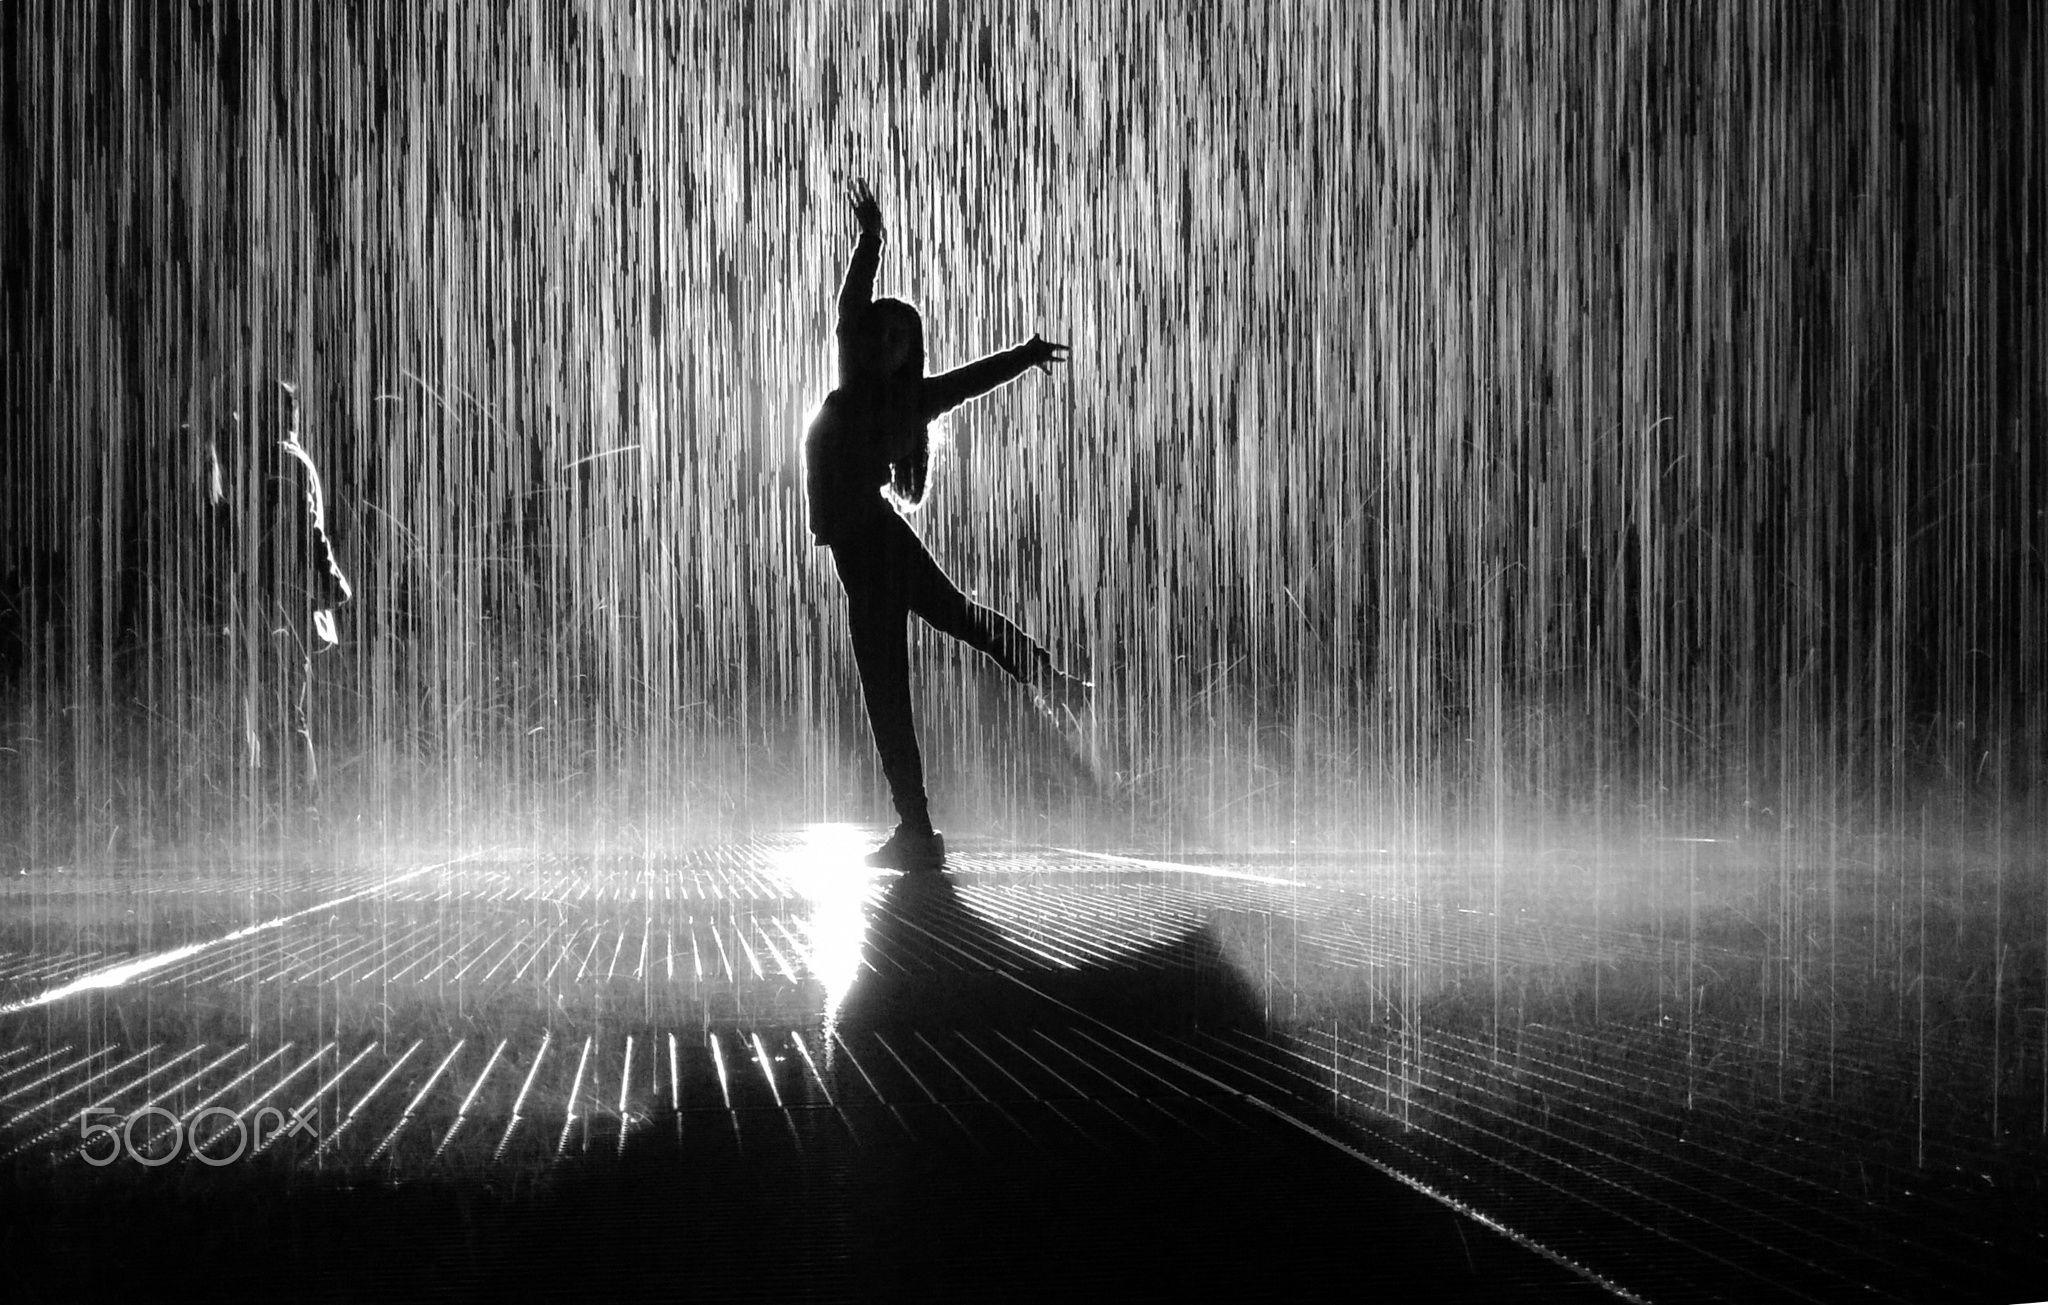 Dancing In The Rain Its Taken In The Rain Room Designed By Random International